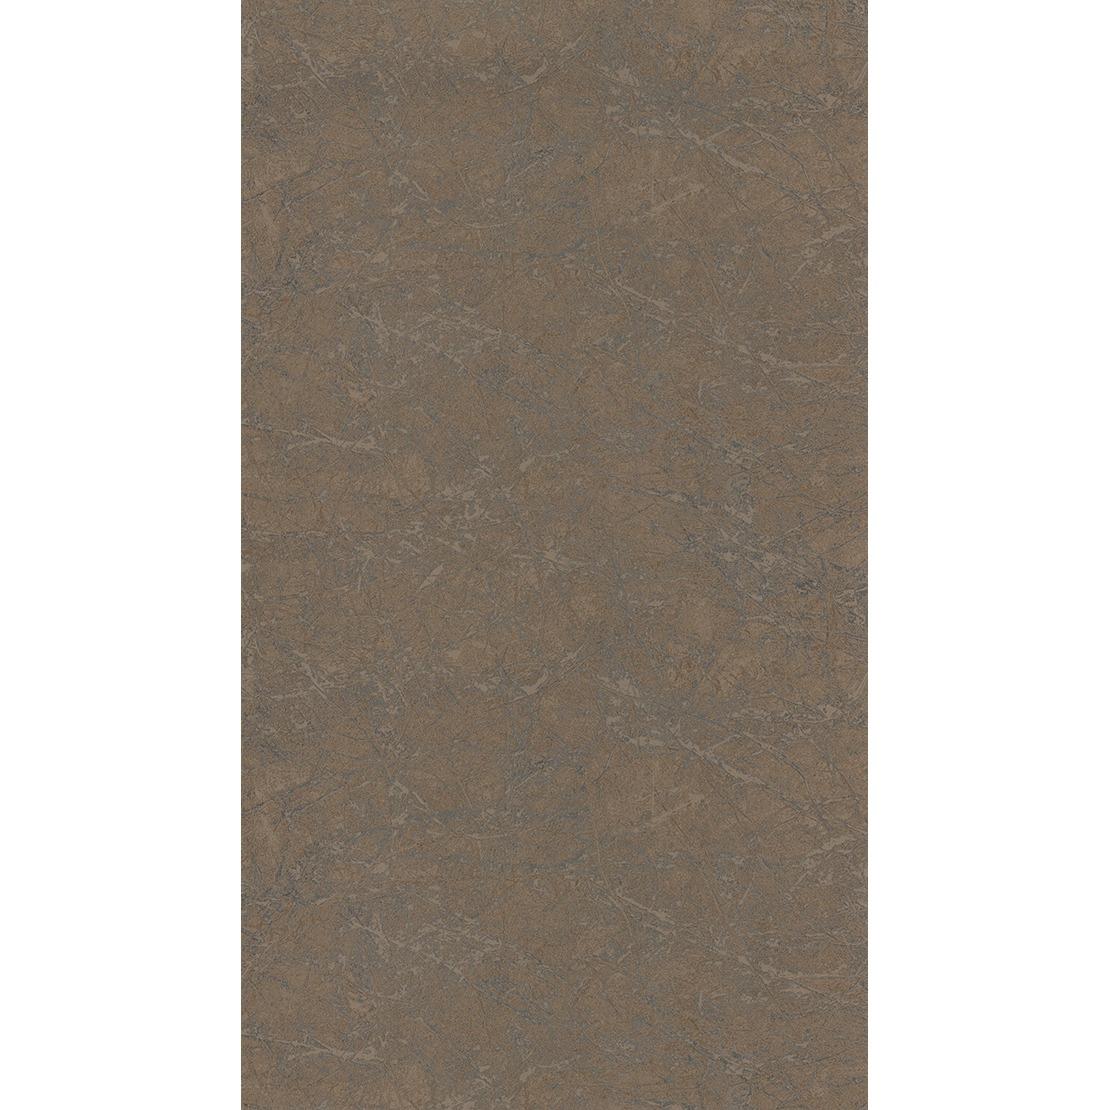 Французские обои Casadeco,  коллекция Oxyde, артикулOXY29123115